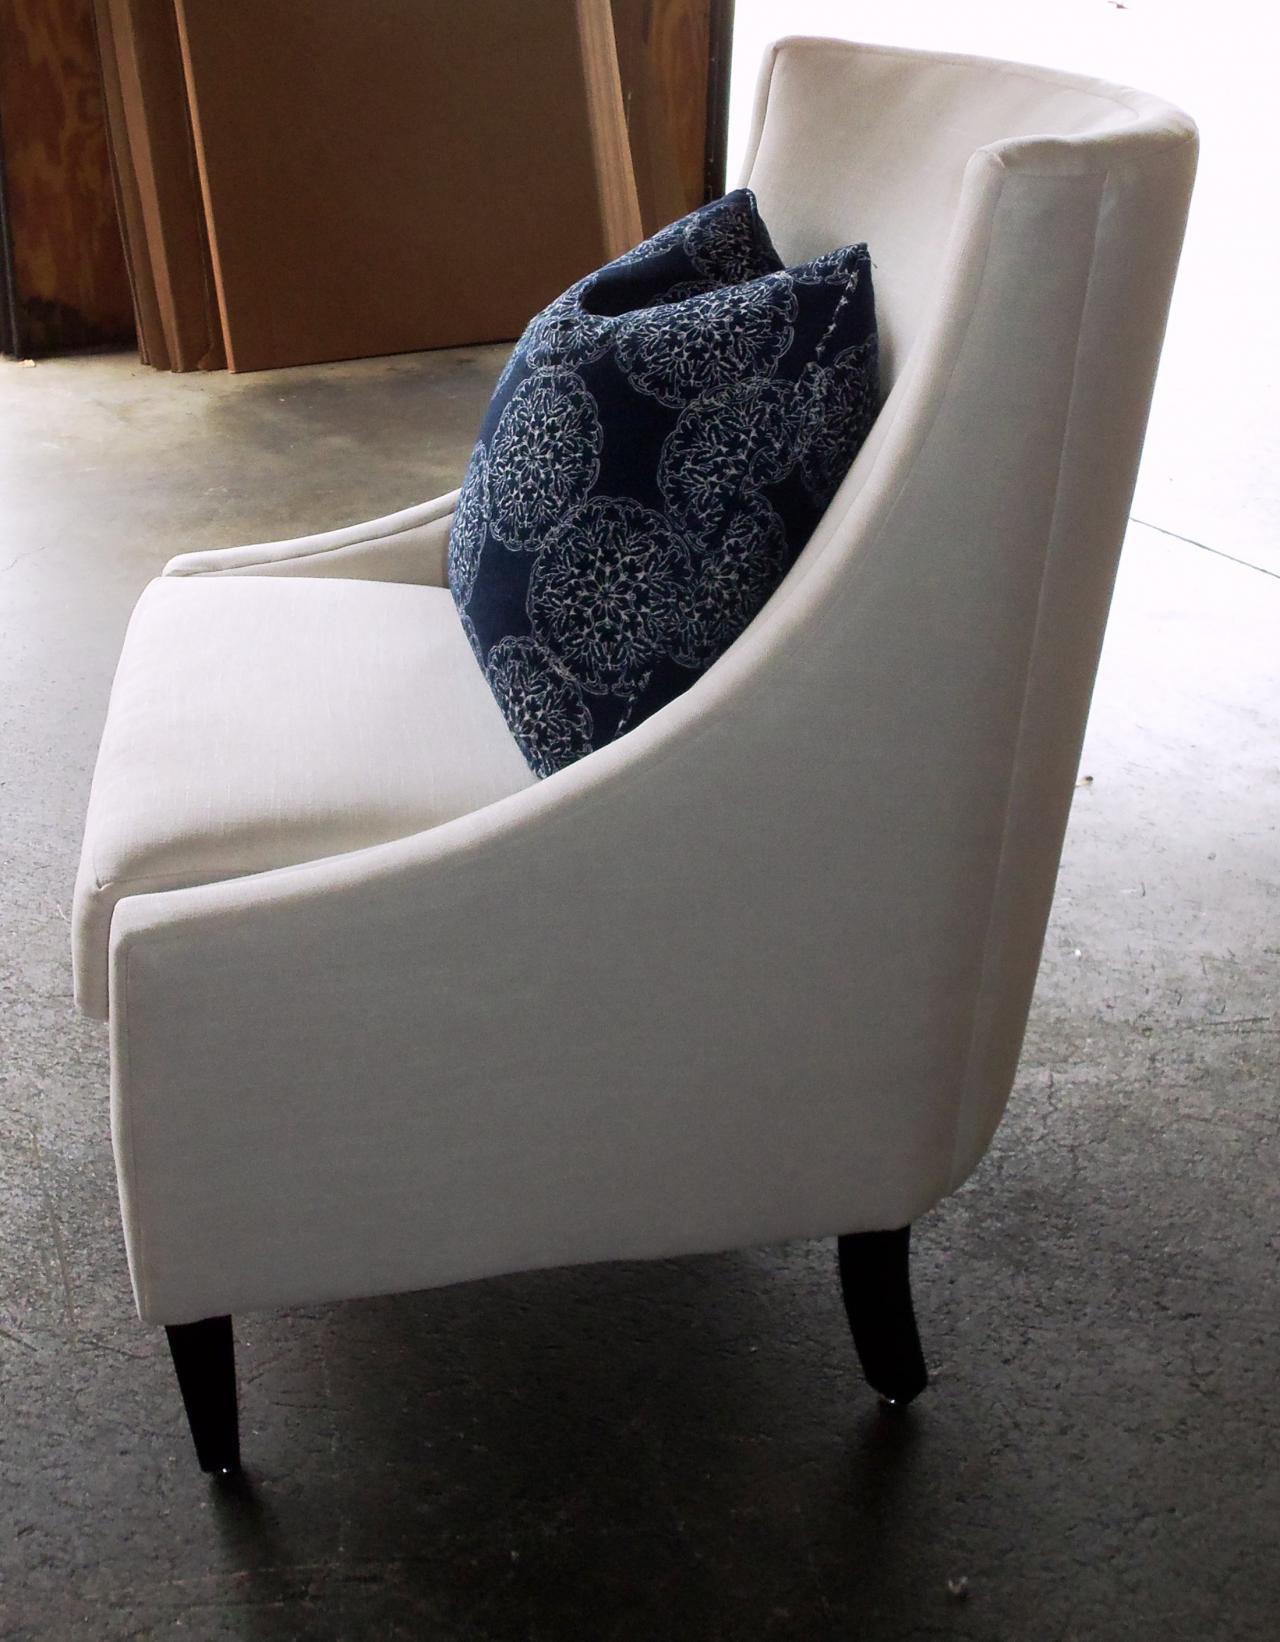 Barnett Furniture - Rowe furniture Dixon chair